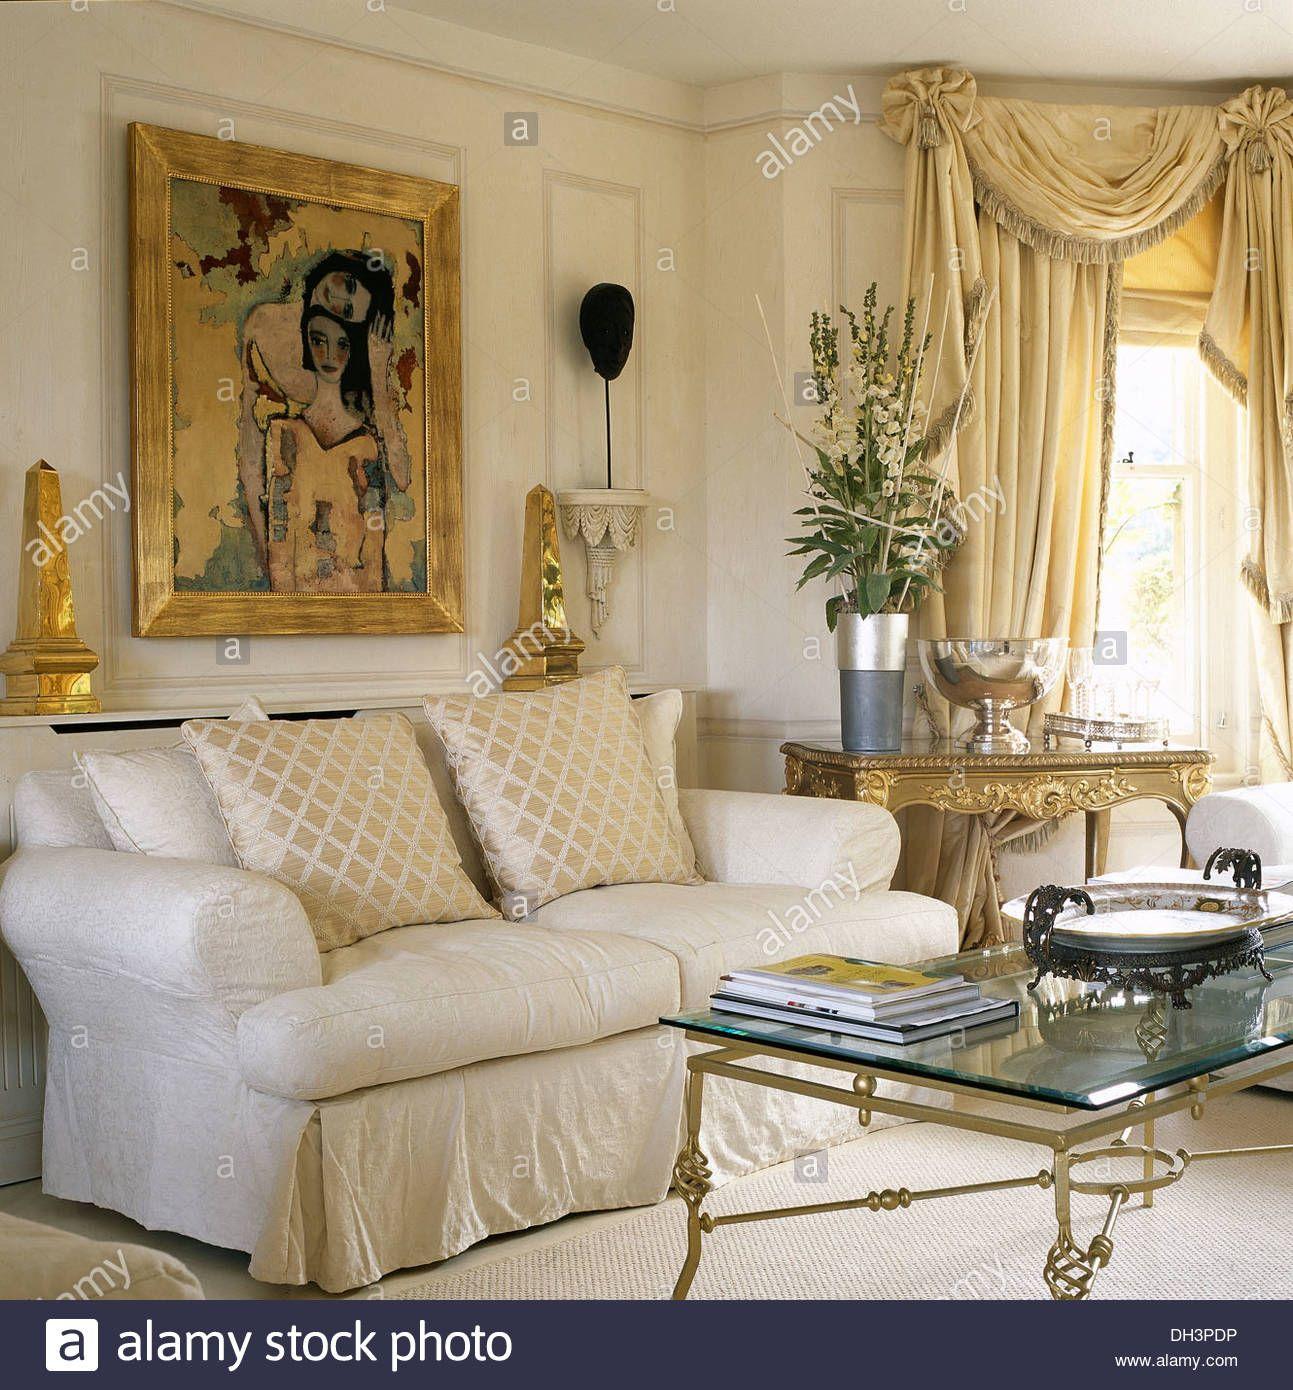 30 Brilliant Image Of Opulent Living Room Living Room Furniture